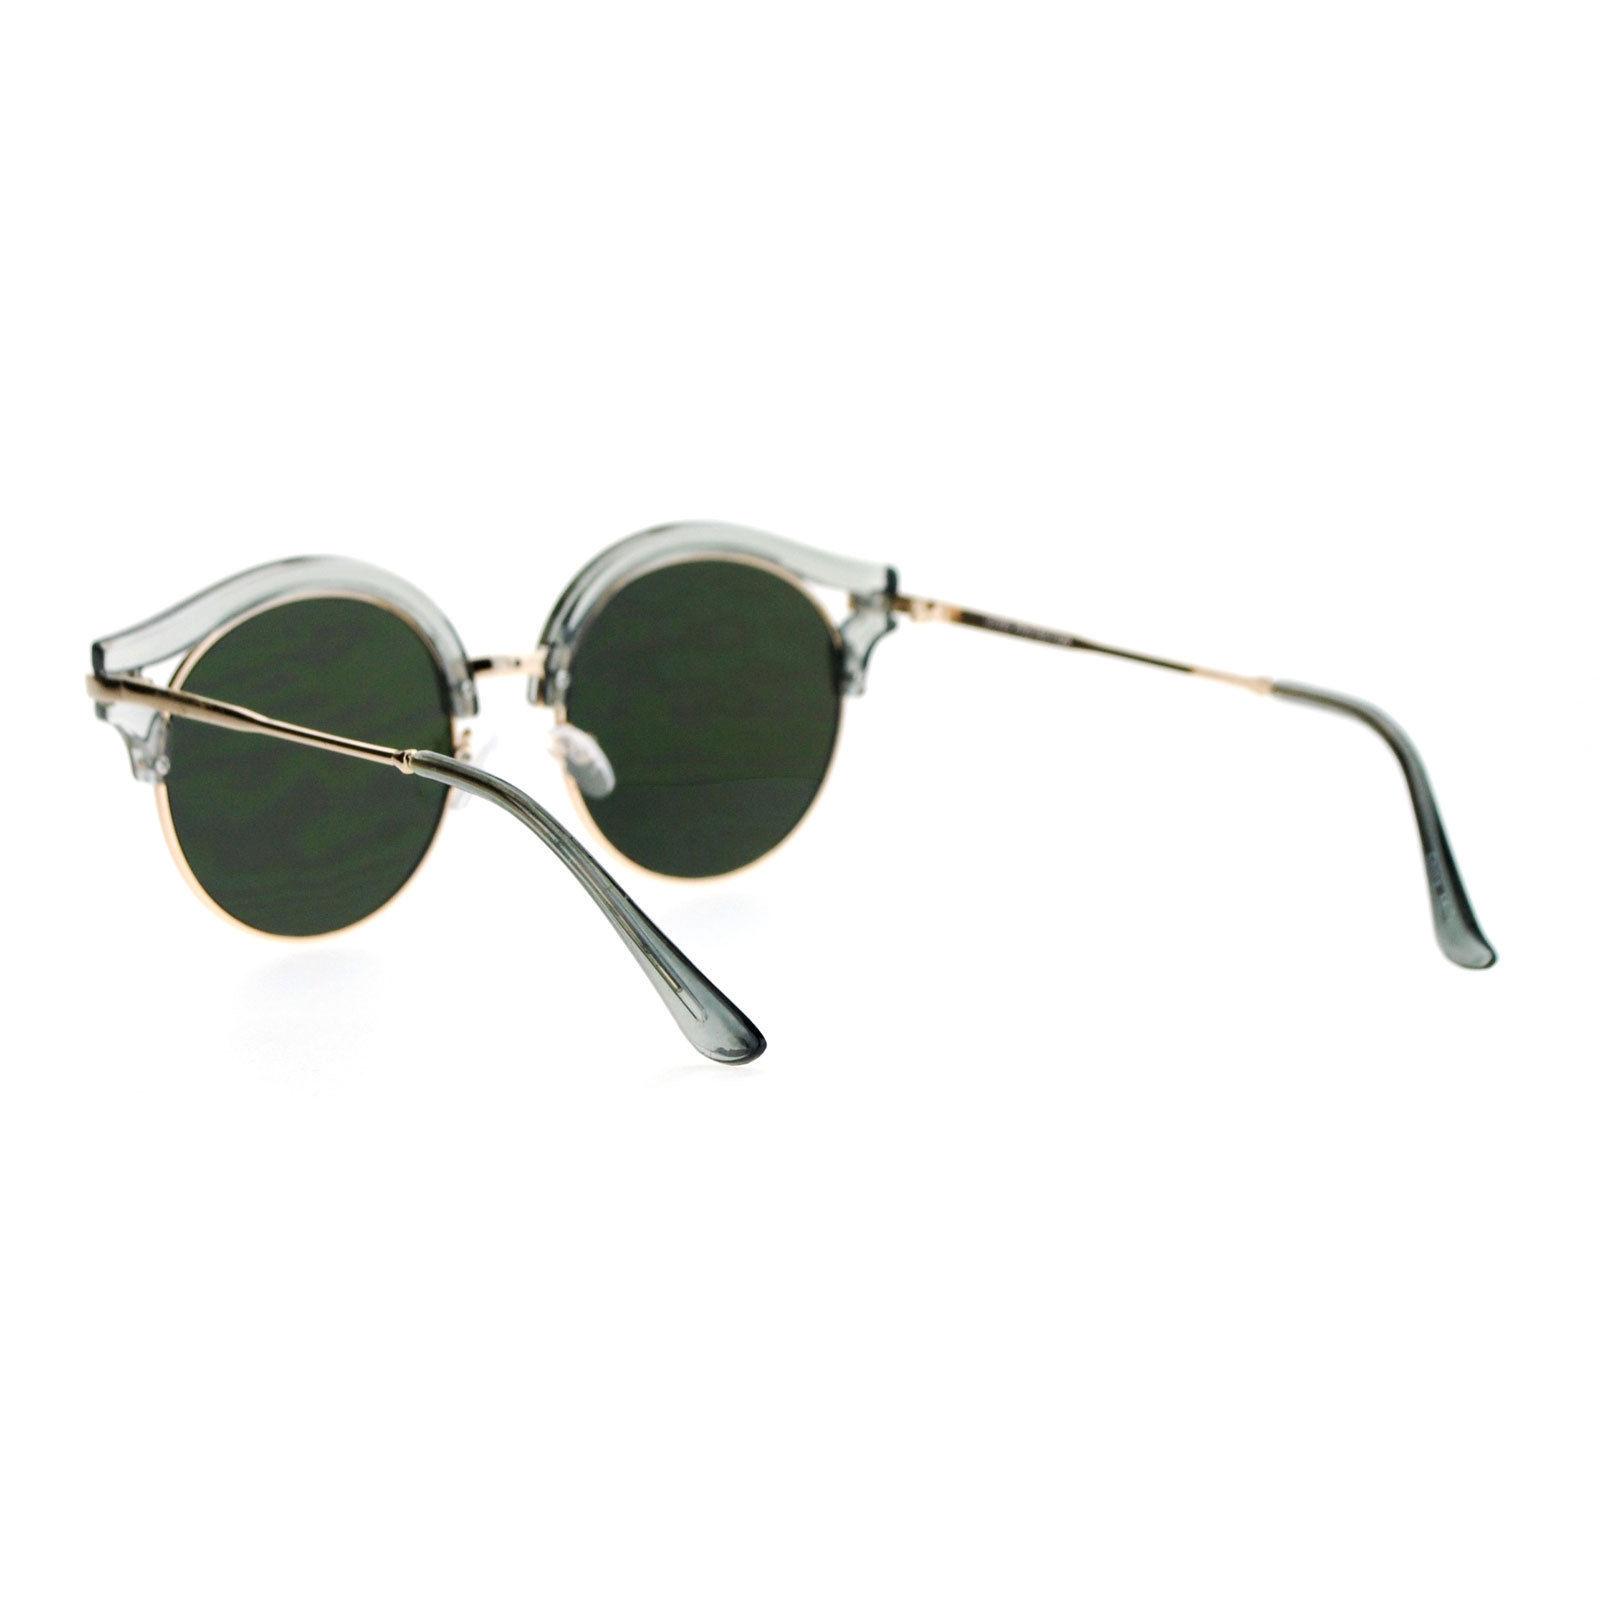 041d494f51c5e SA106 Retro Color Mirror Lens Round Circle Half Rim Womens Sunglasses